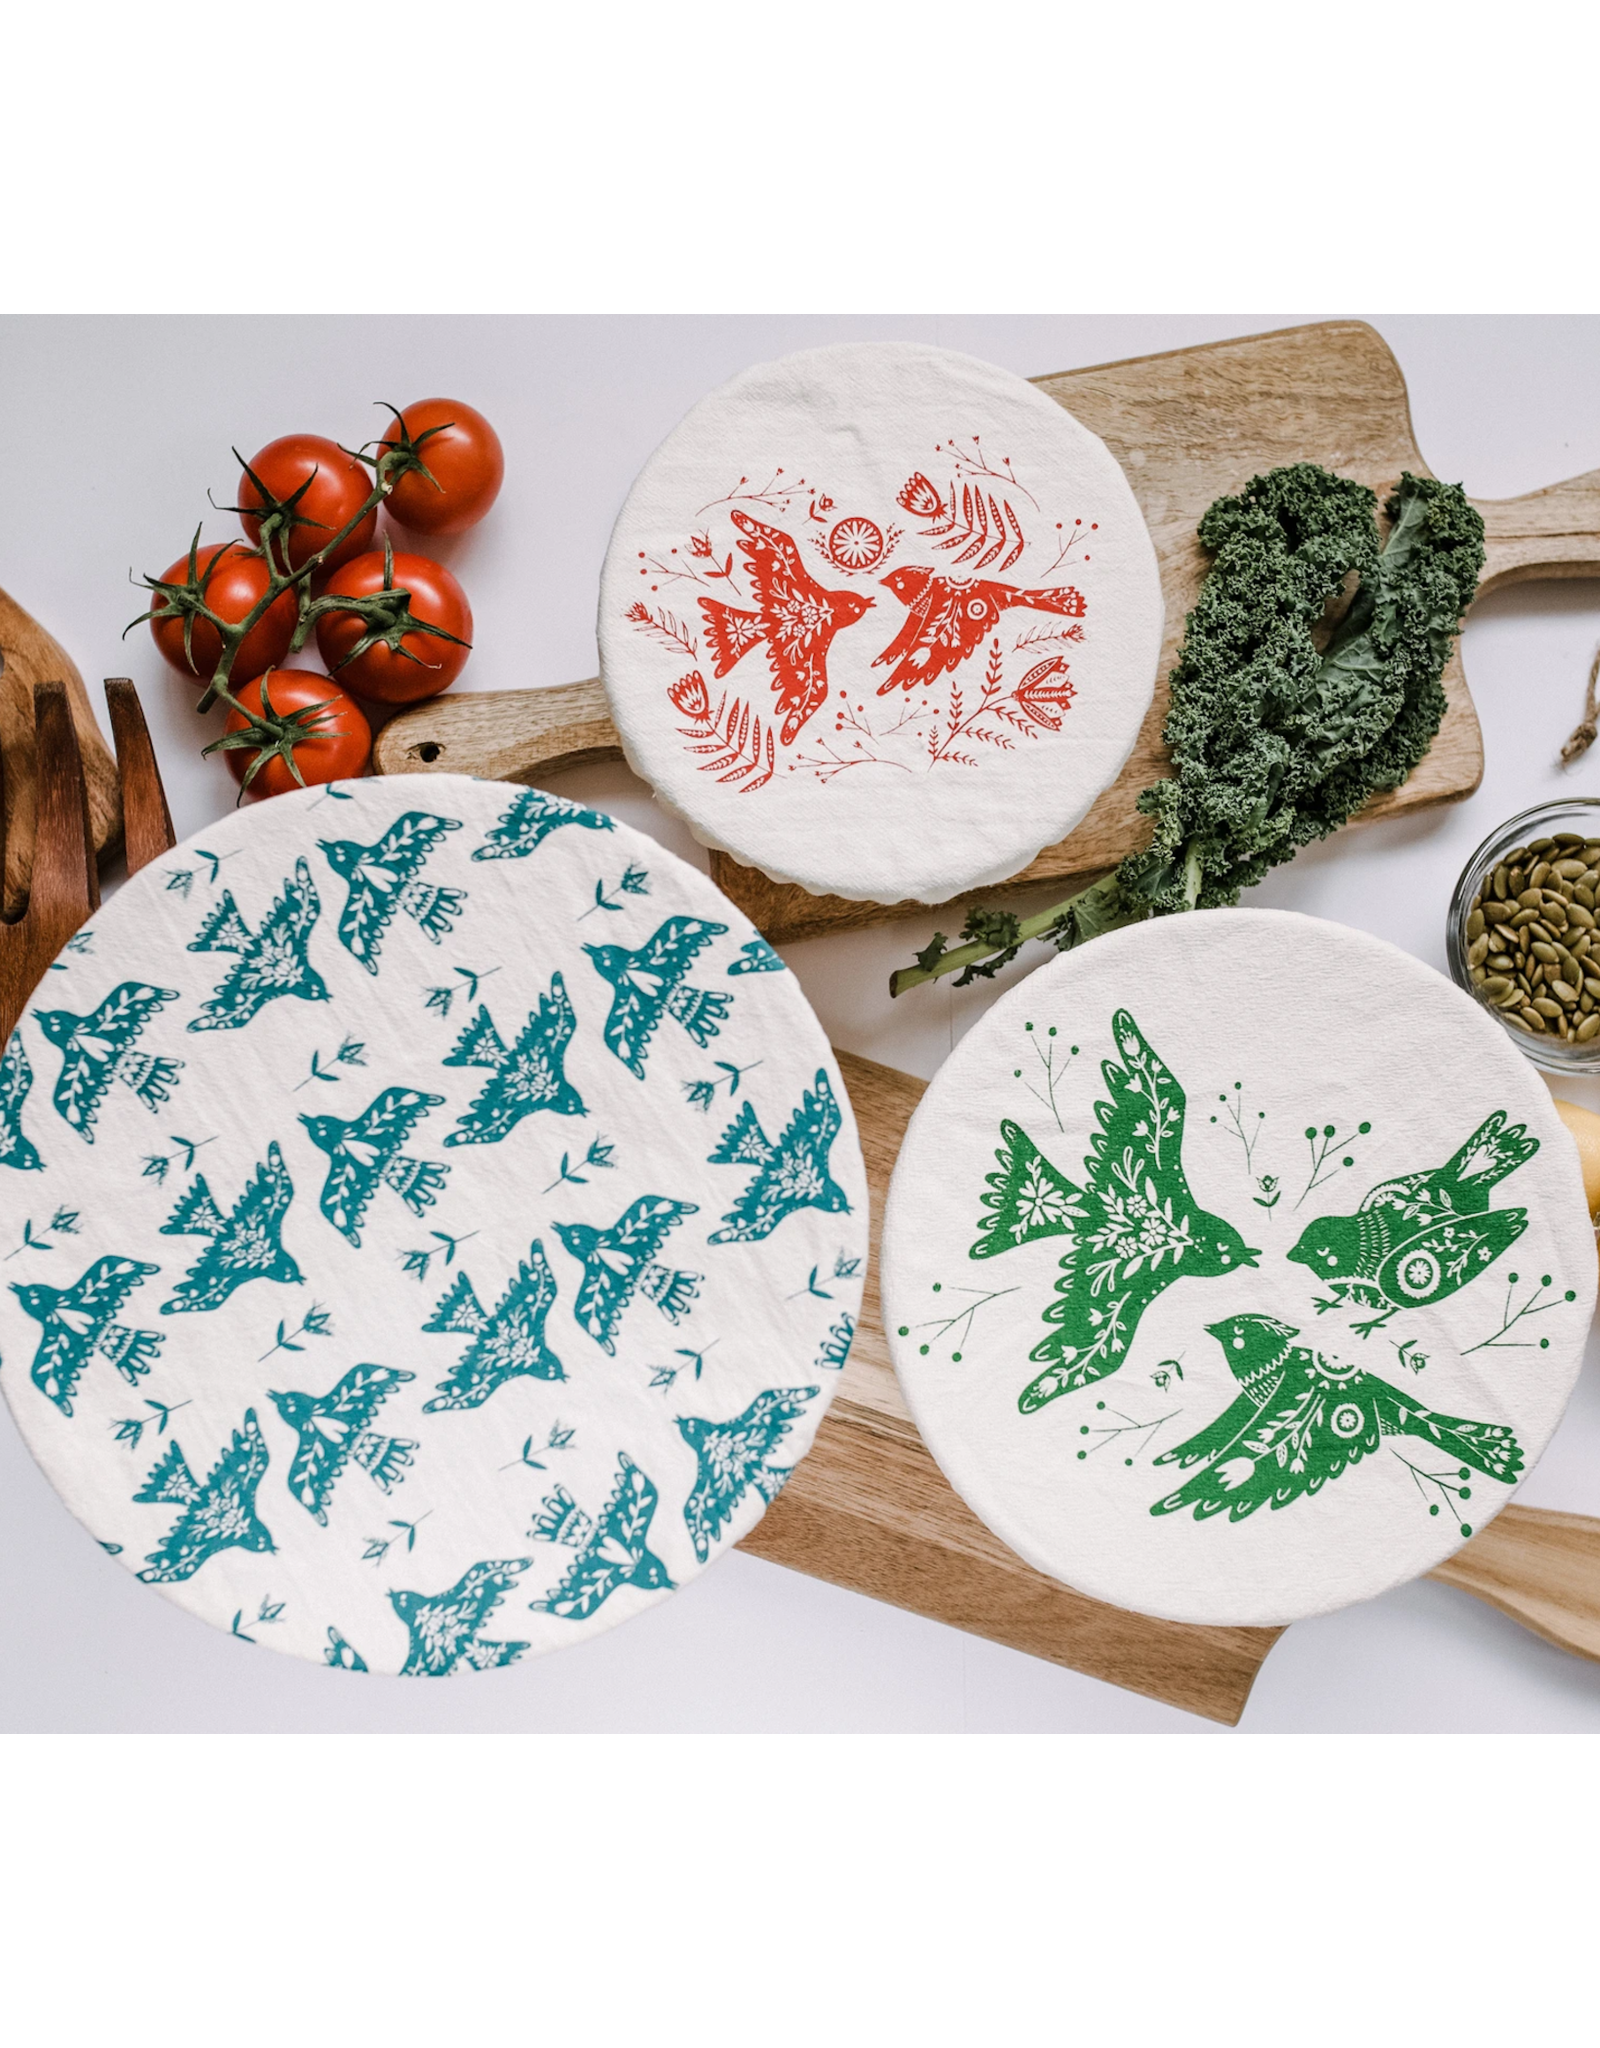 Your Green Kitchen Folk Bird Bowl Cover Trio (XL, L, M)